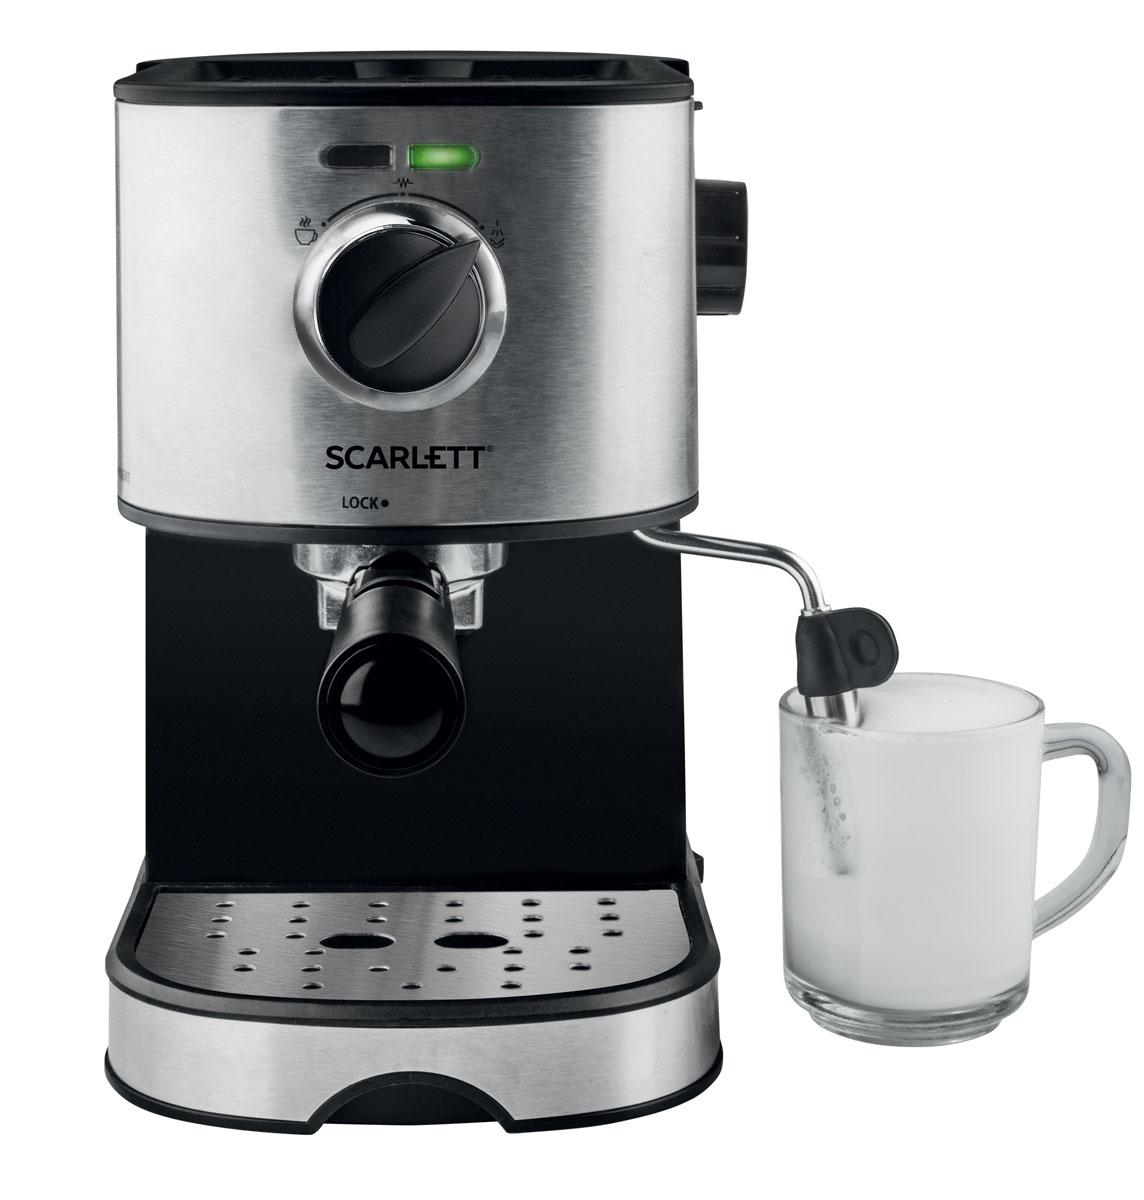 Scarlett SL-CM53001, Black кофеварка - Кофеварки и кофемашины